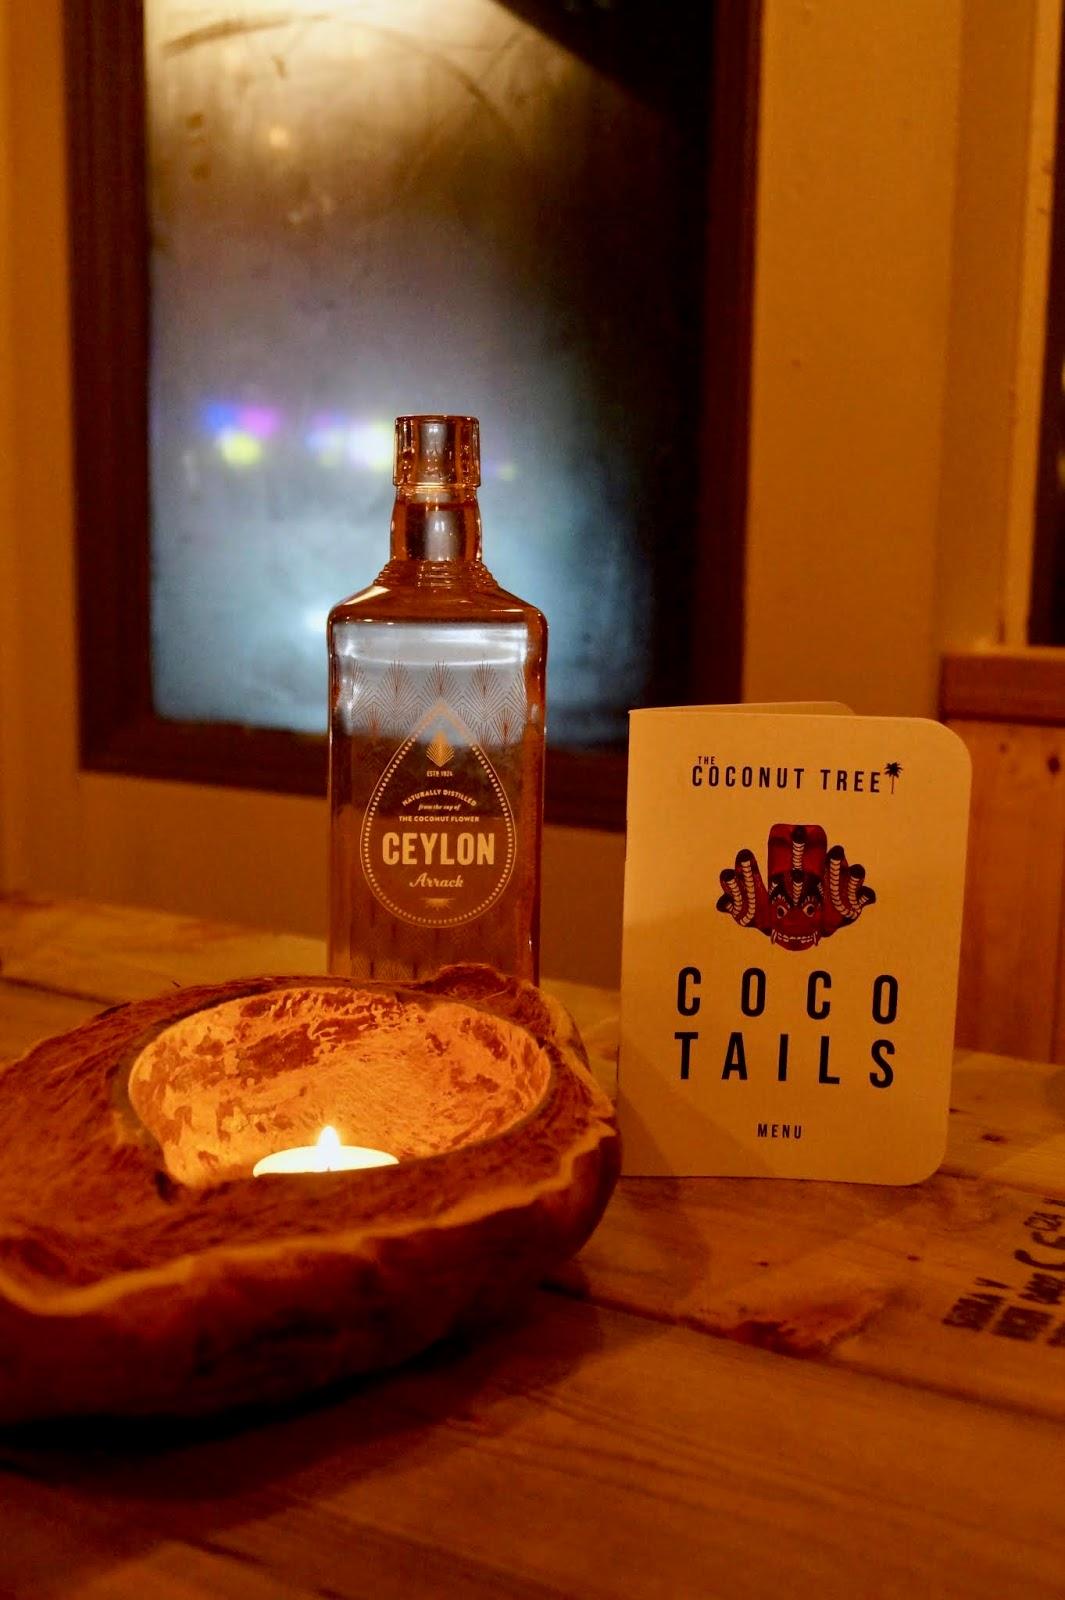 ceylon arrack bottle at the coconut tree